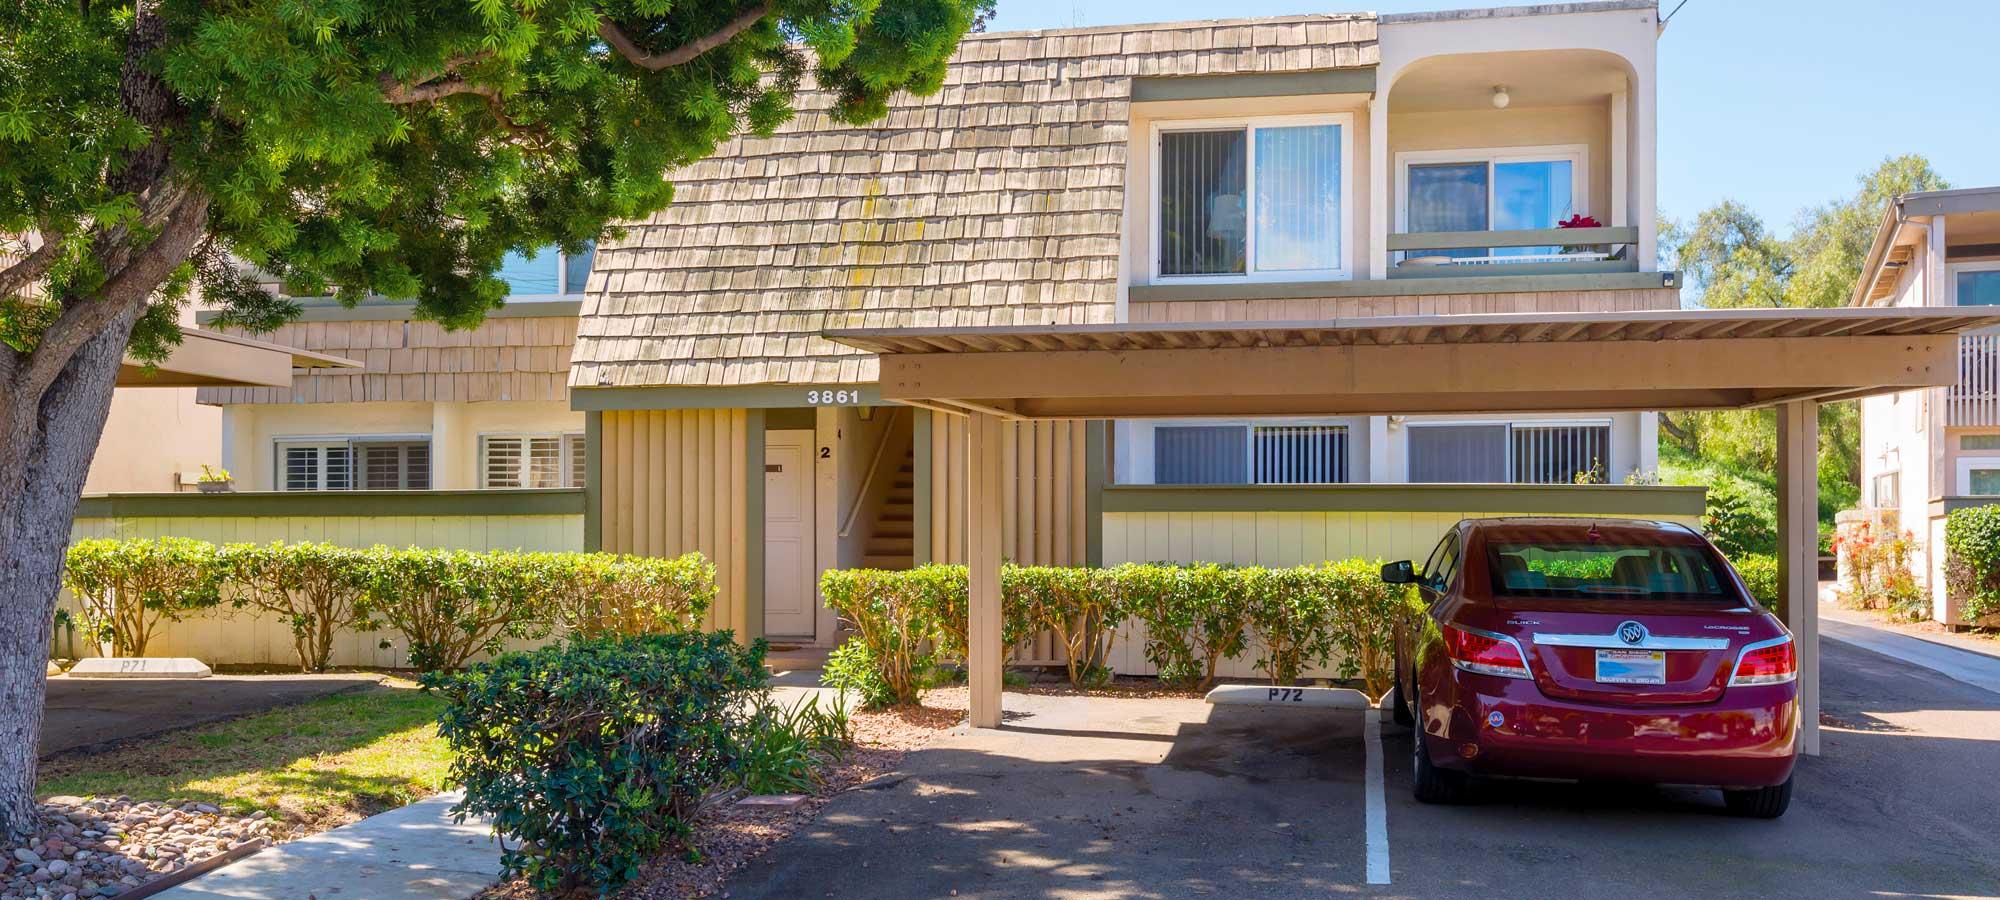 3861 Basilone St. Unit 3 San Diego, CA 92110